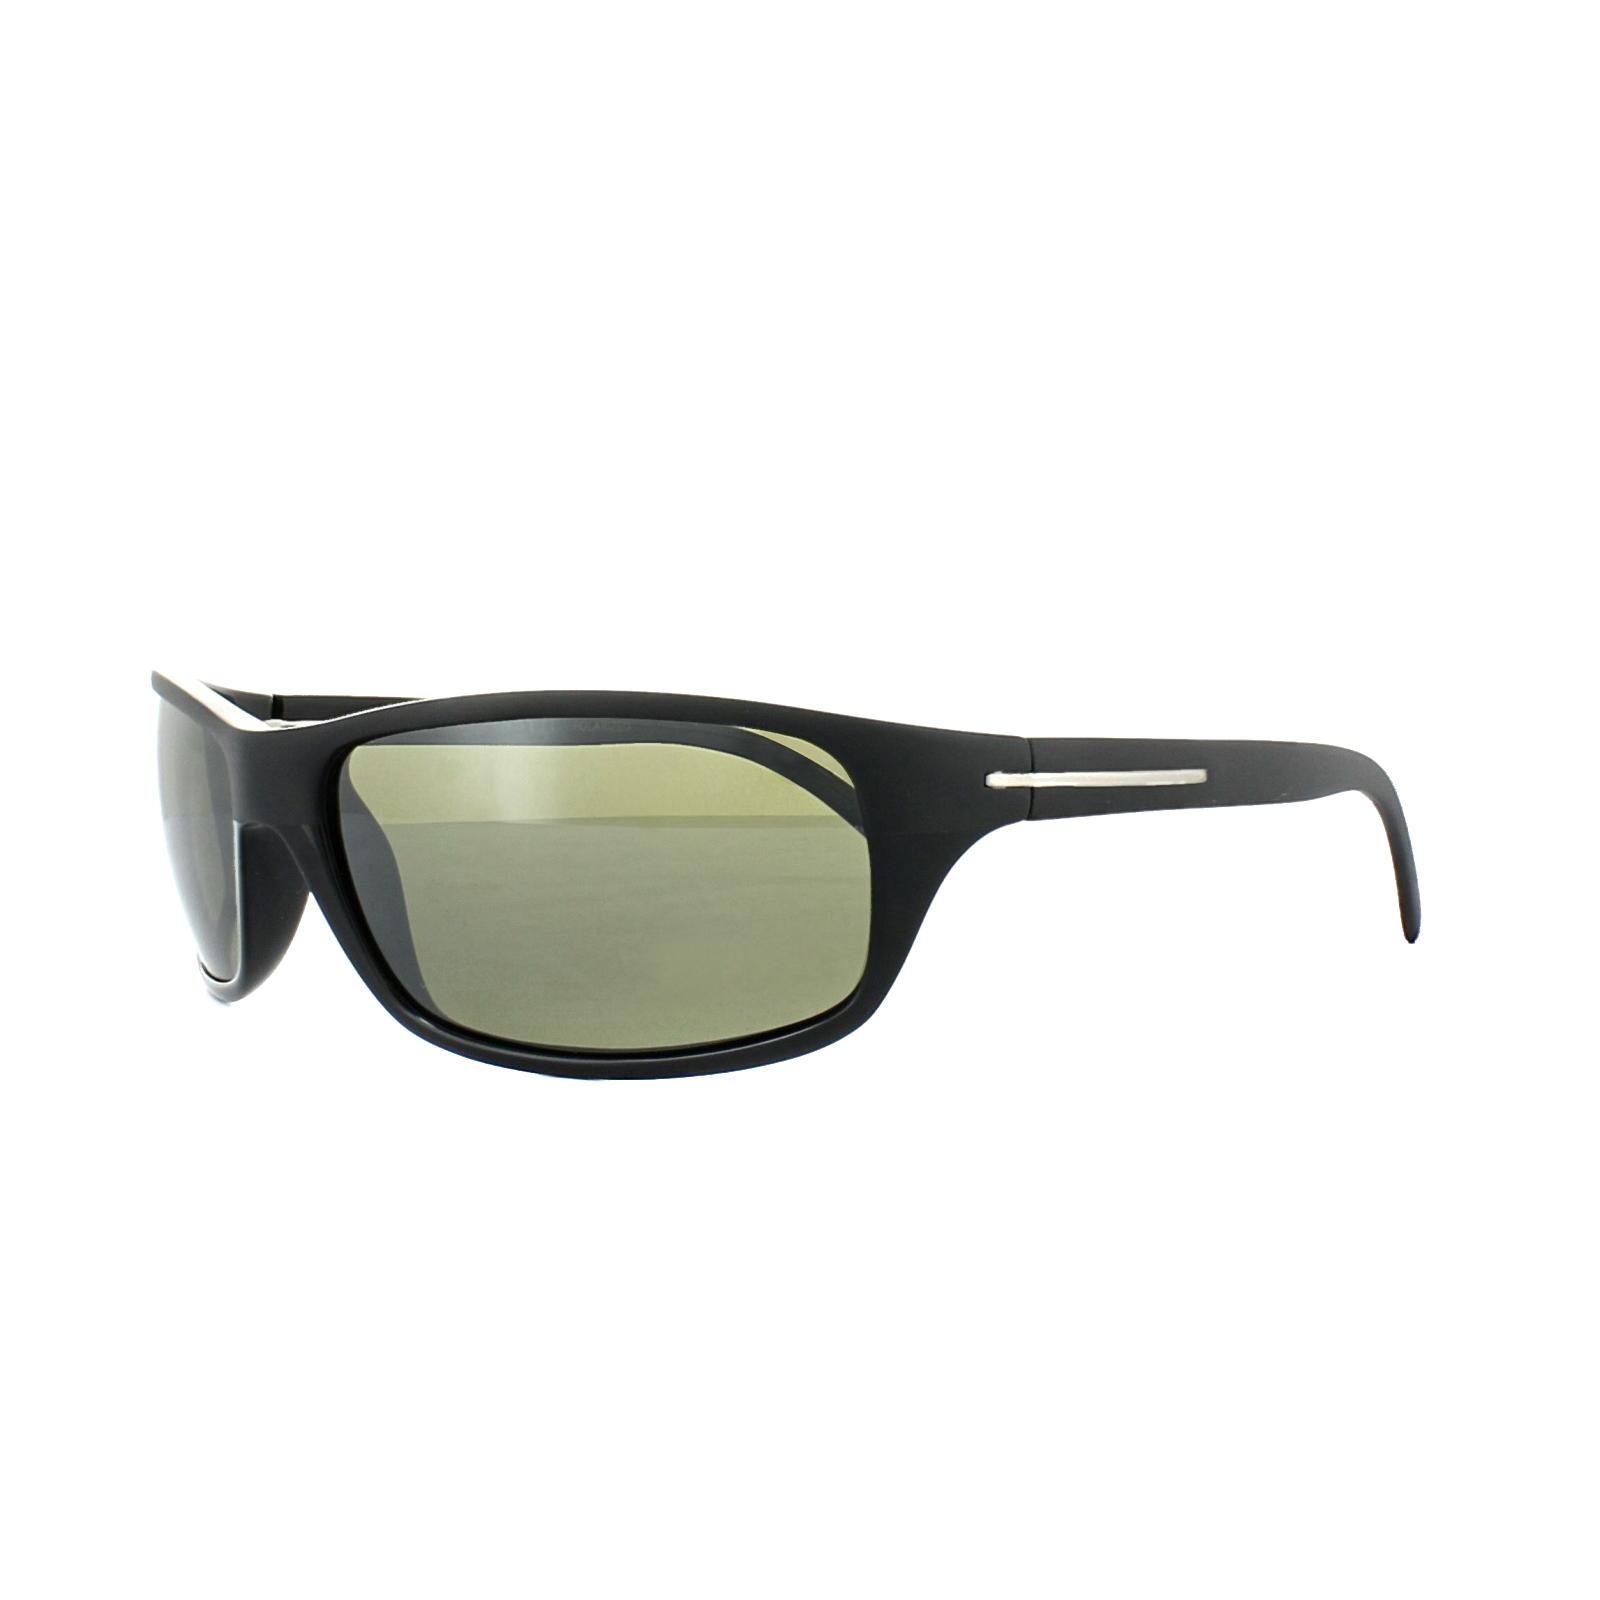 3d548f203bfd82 Sentinel Serengeti Sunglasses Pisa 8279 Satin Shiny Black Green 555nm  Polarized